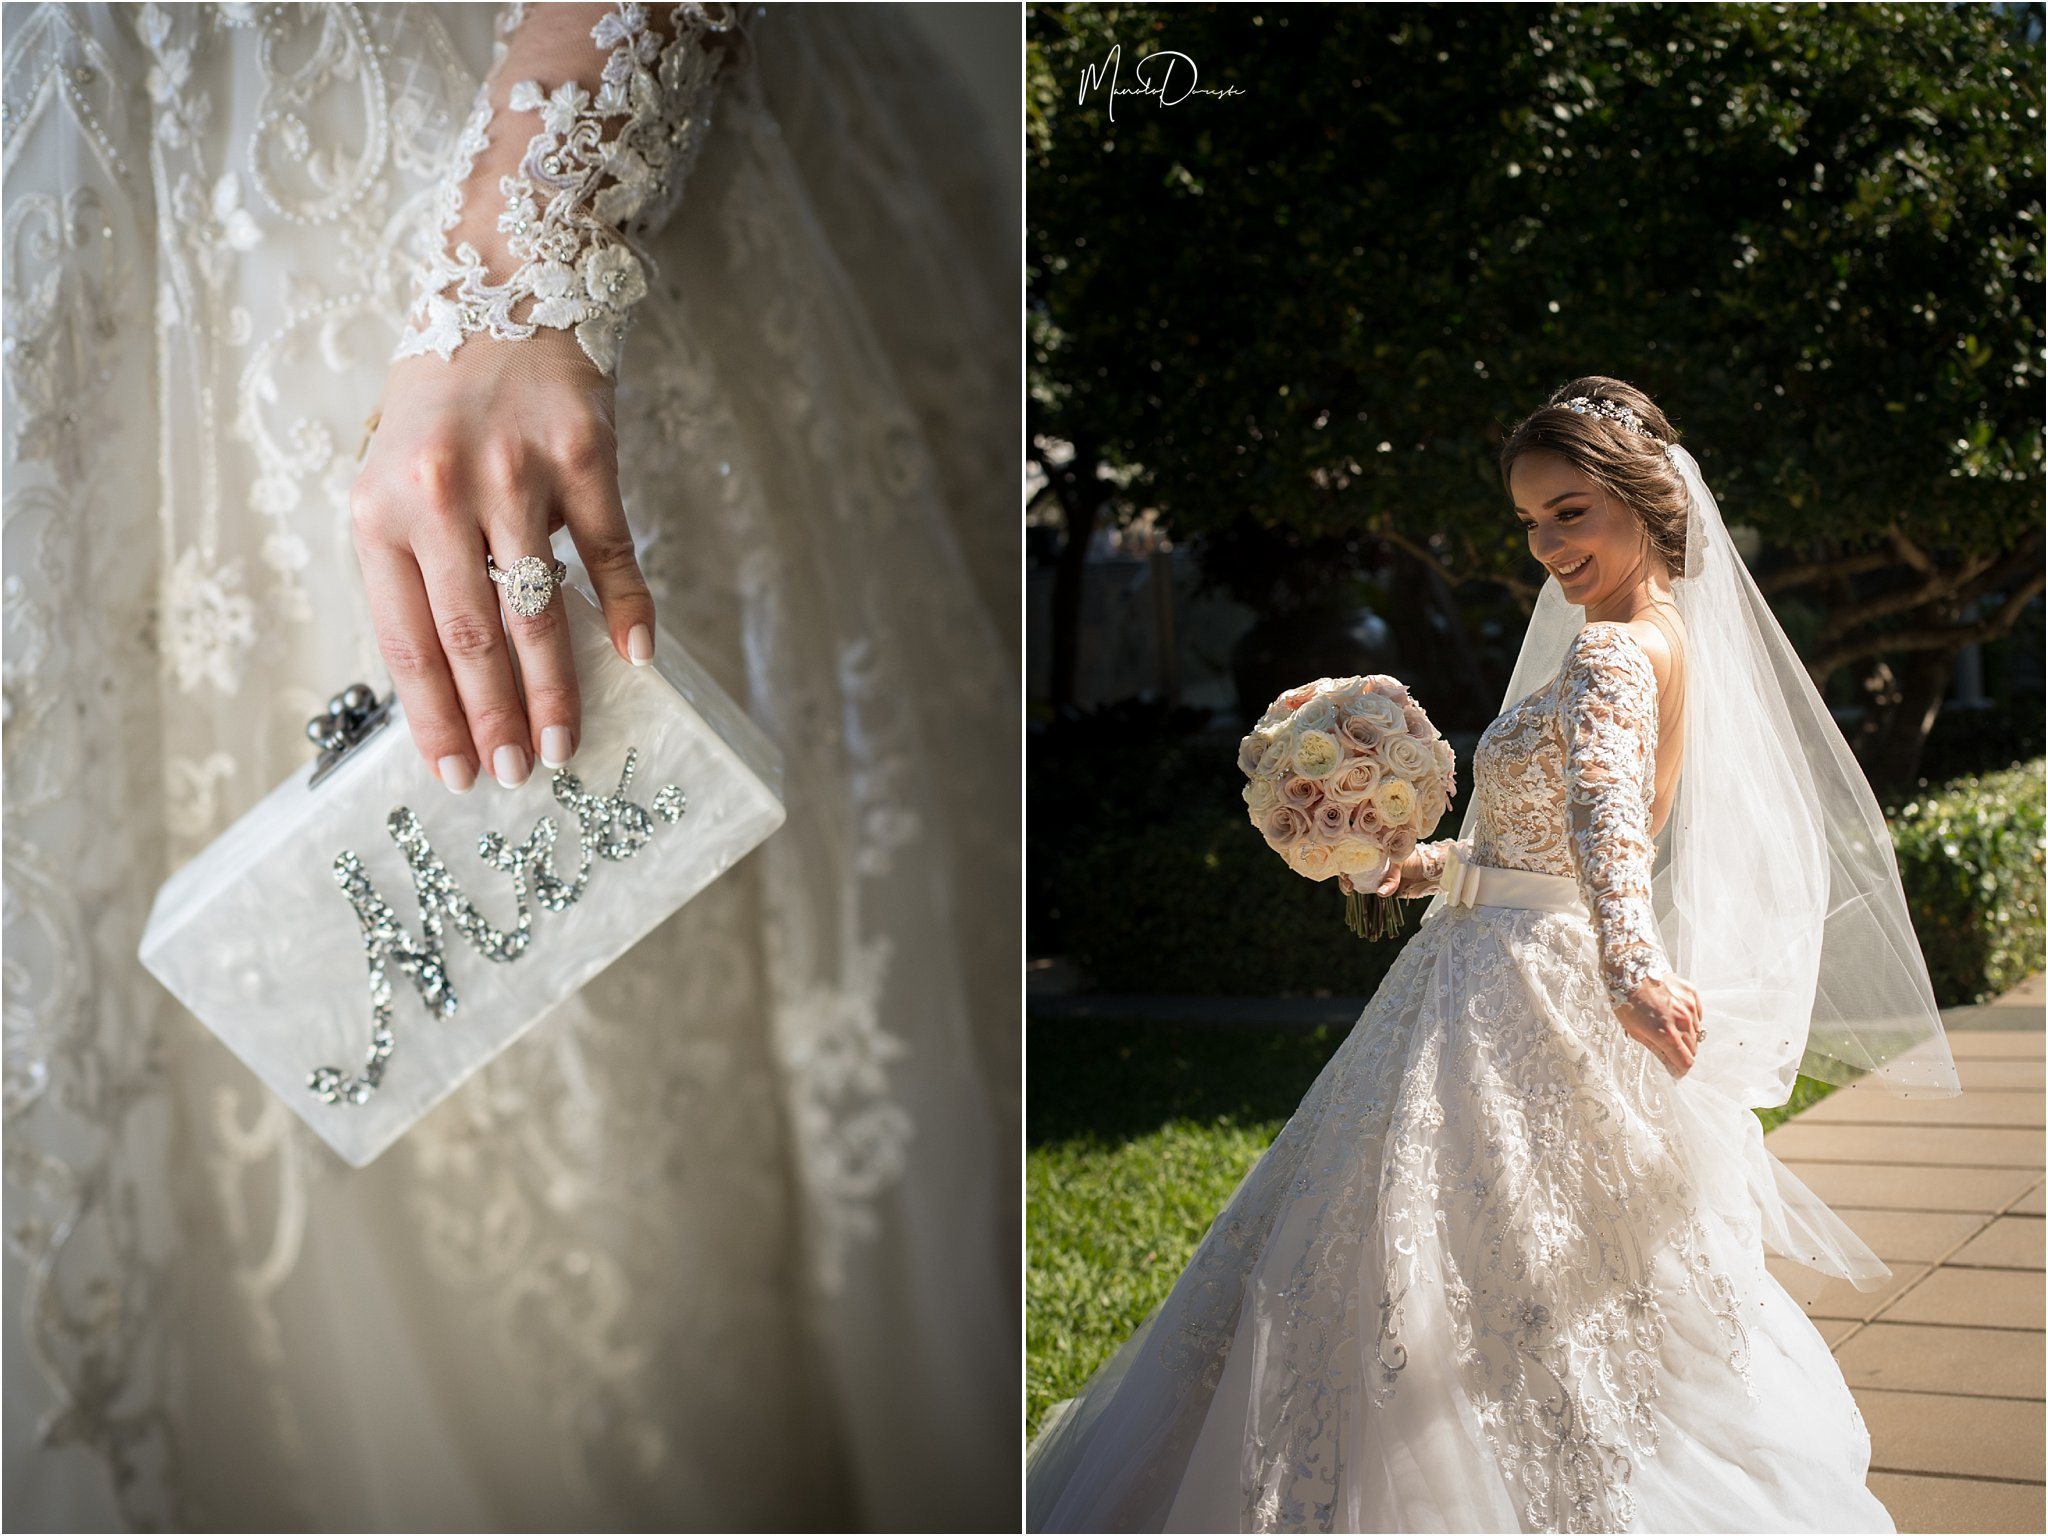 00713_ManoloDoreste_InFocusStudios_Wedding_Family_Photography_Miami_MiamiPhotographer.jpg